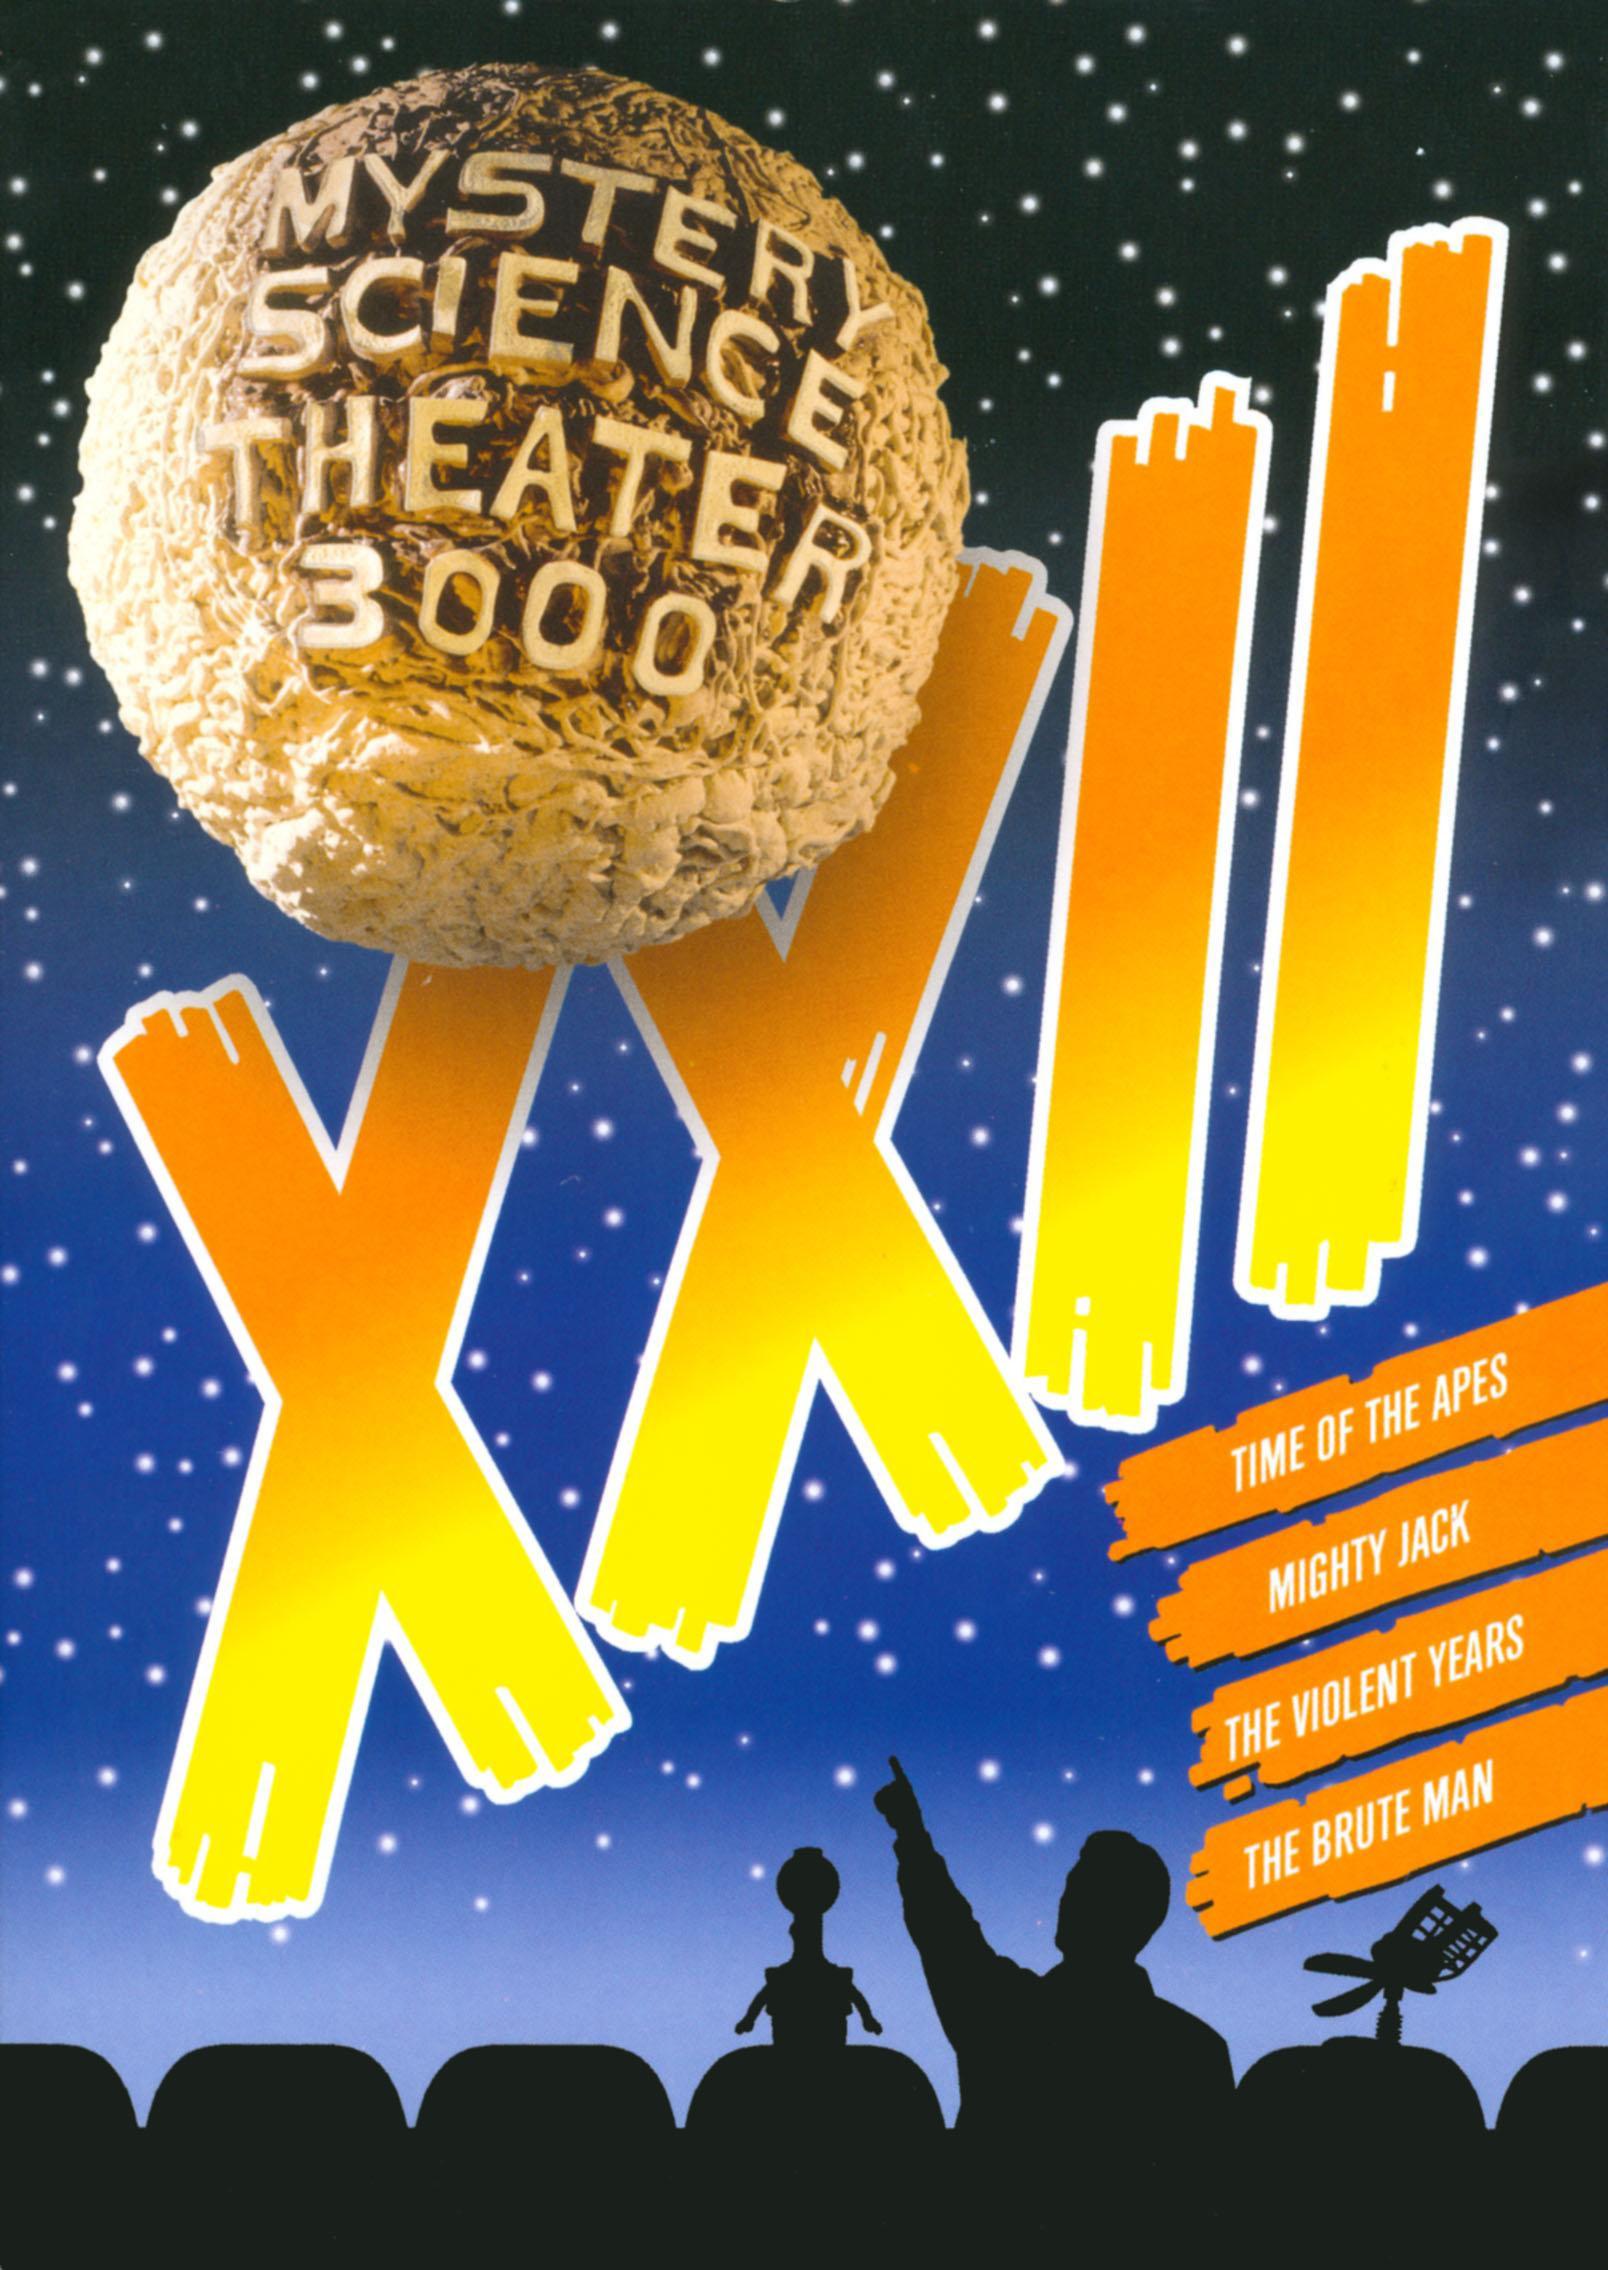 Mystery Science Theater 3000: Xxii [4 Discs] (dvd) 3979101